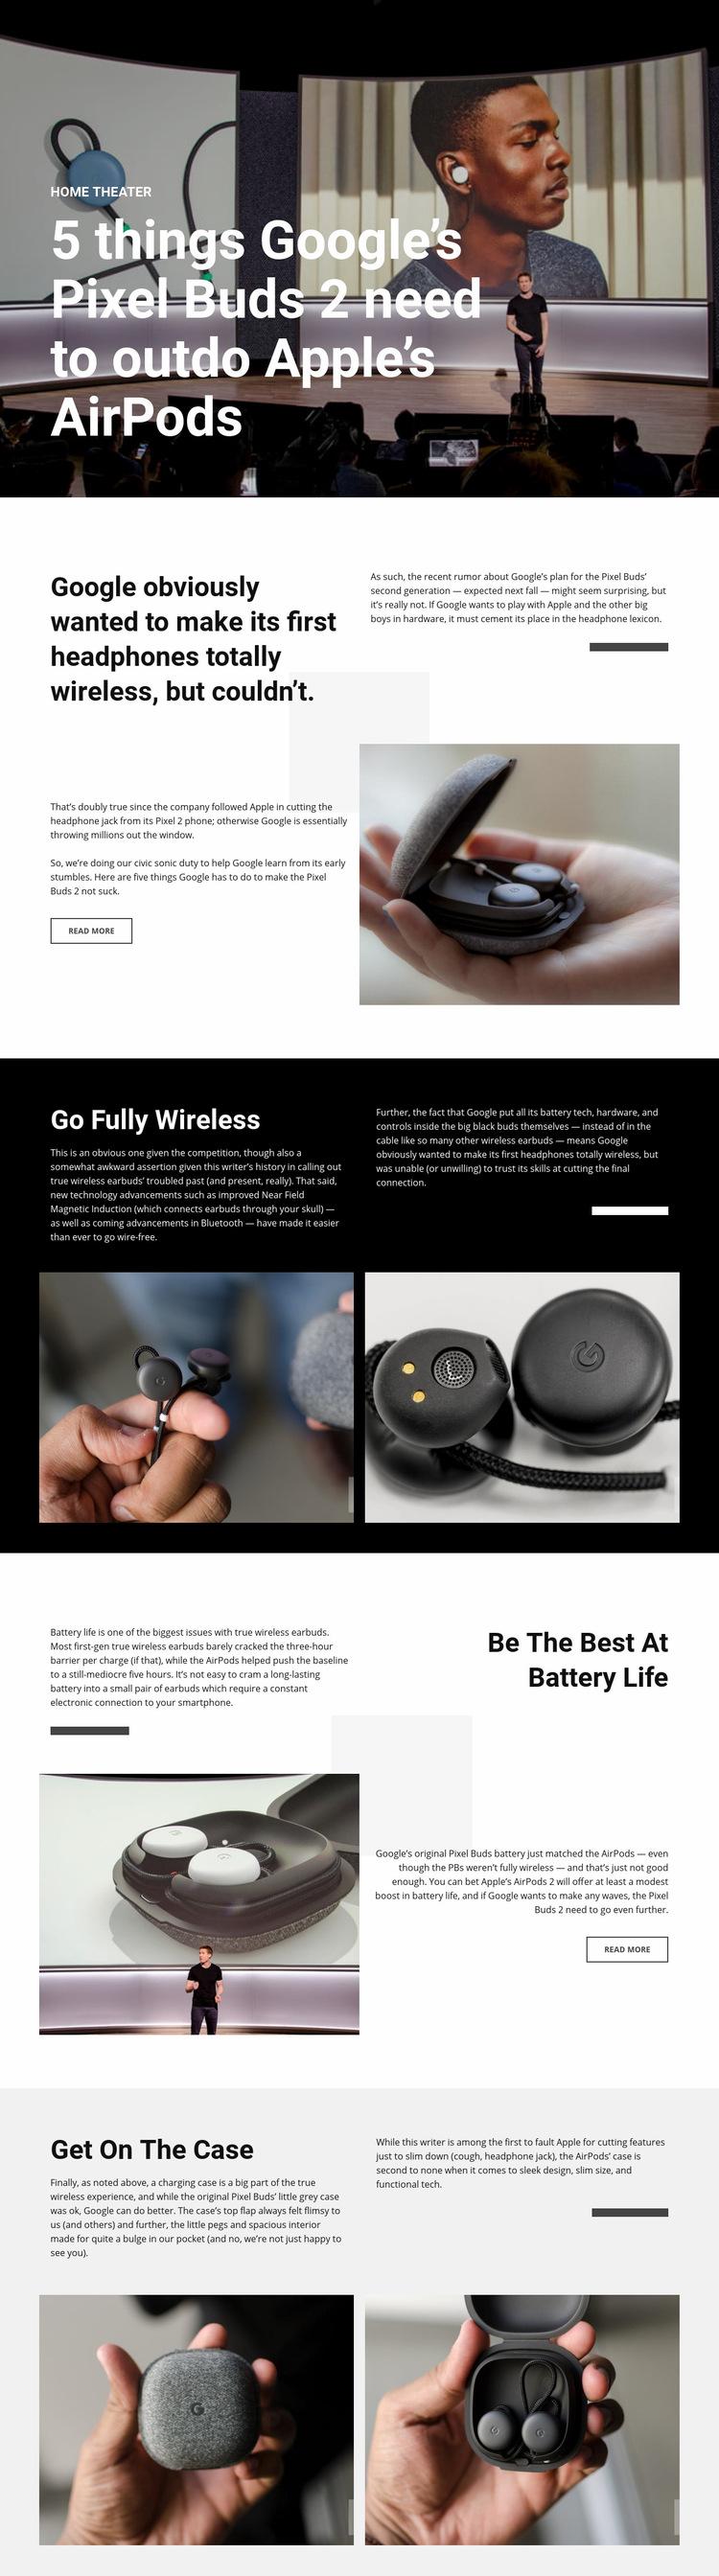 Pixel Buds 2 Web Page Design